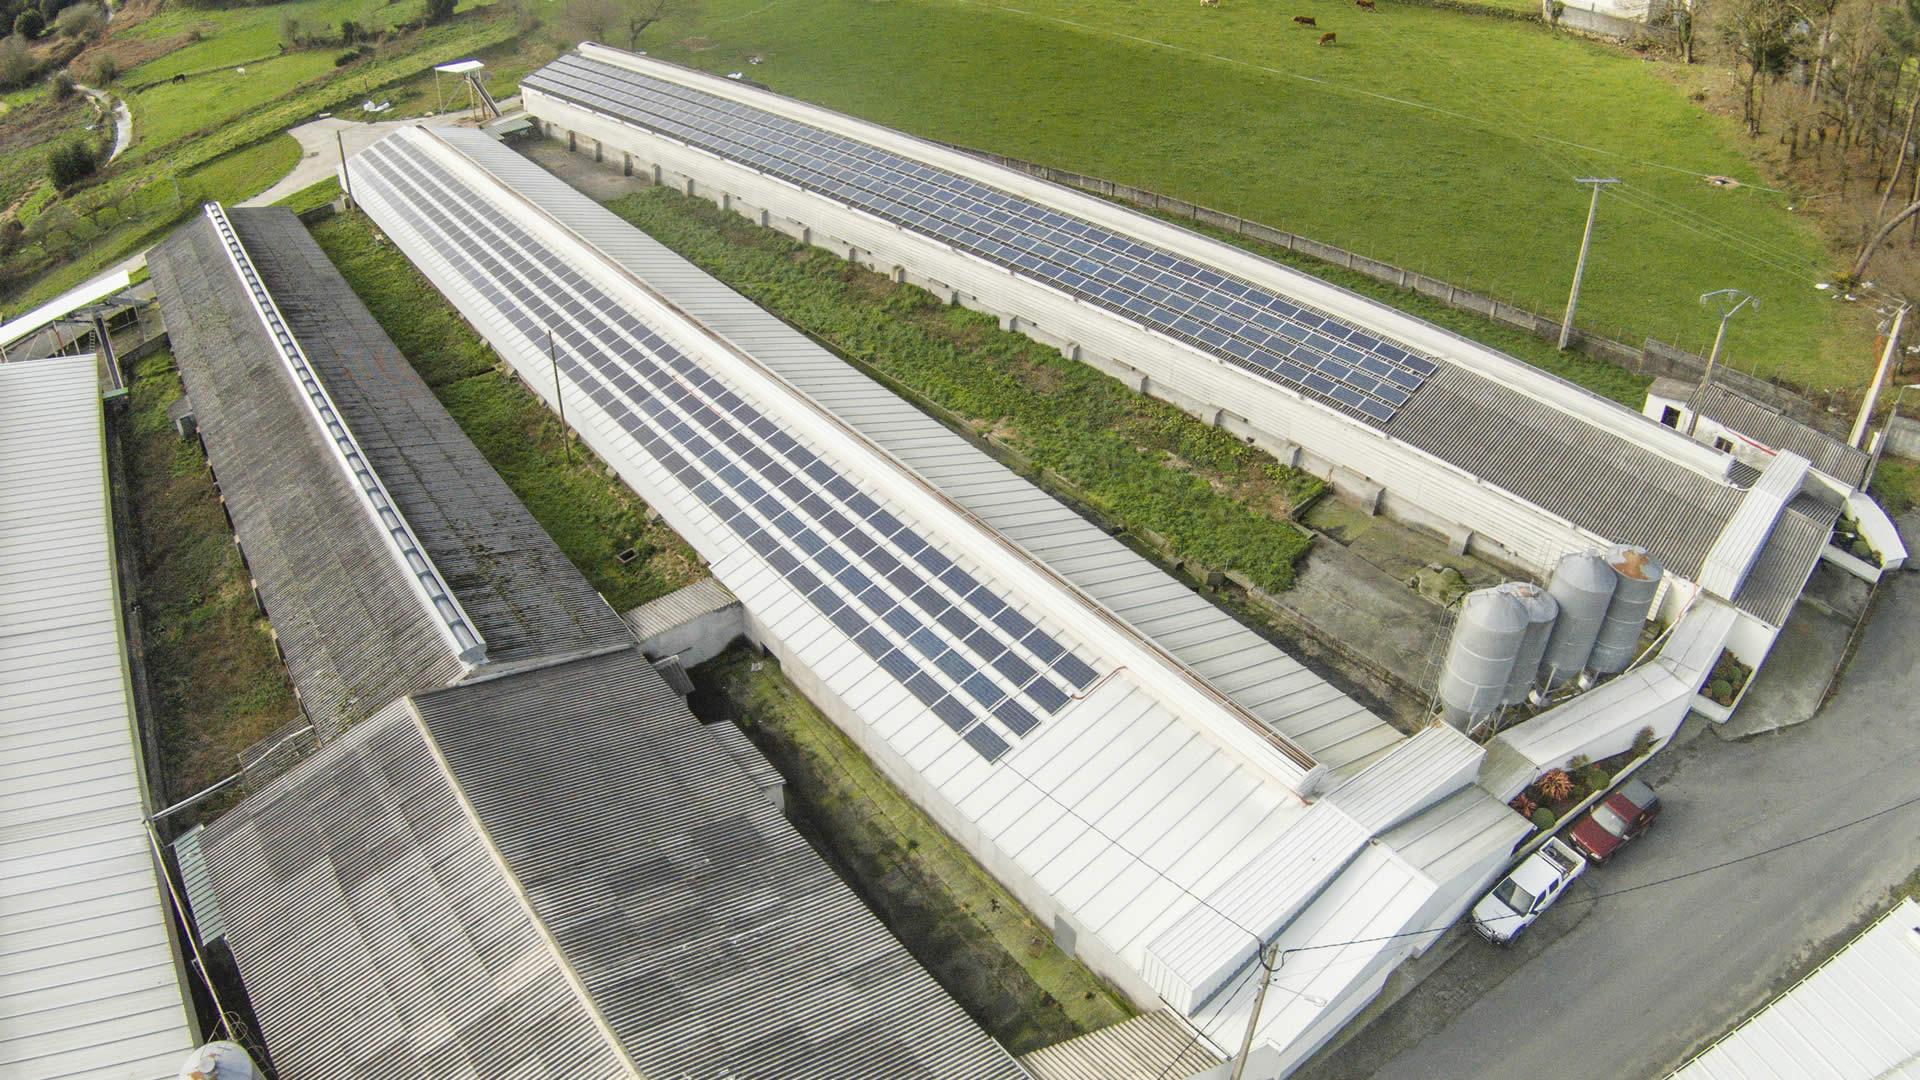 edf-solar-instalacion-paneles-solares-granja-campomayor-5